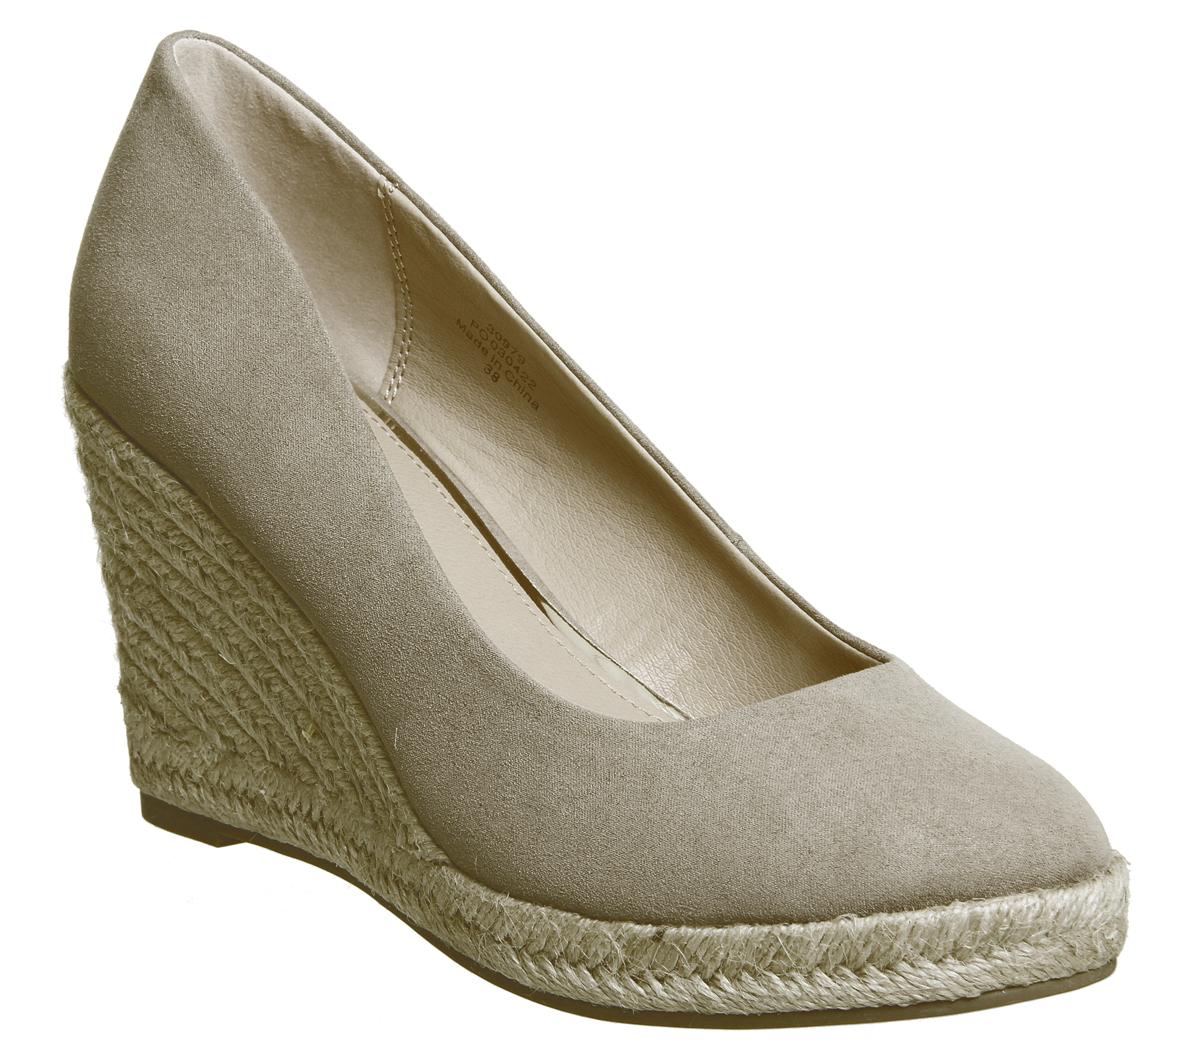 c1b34c202058 Sentinel Womens Office Marbella Closed Toe Espadrilles Taupe Heels